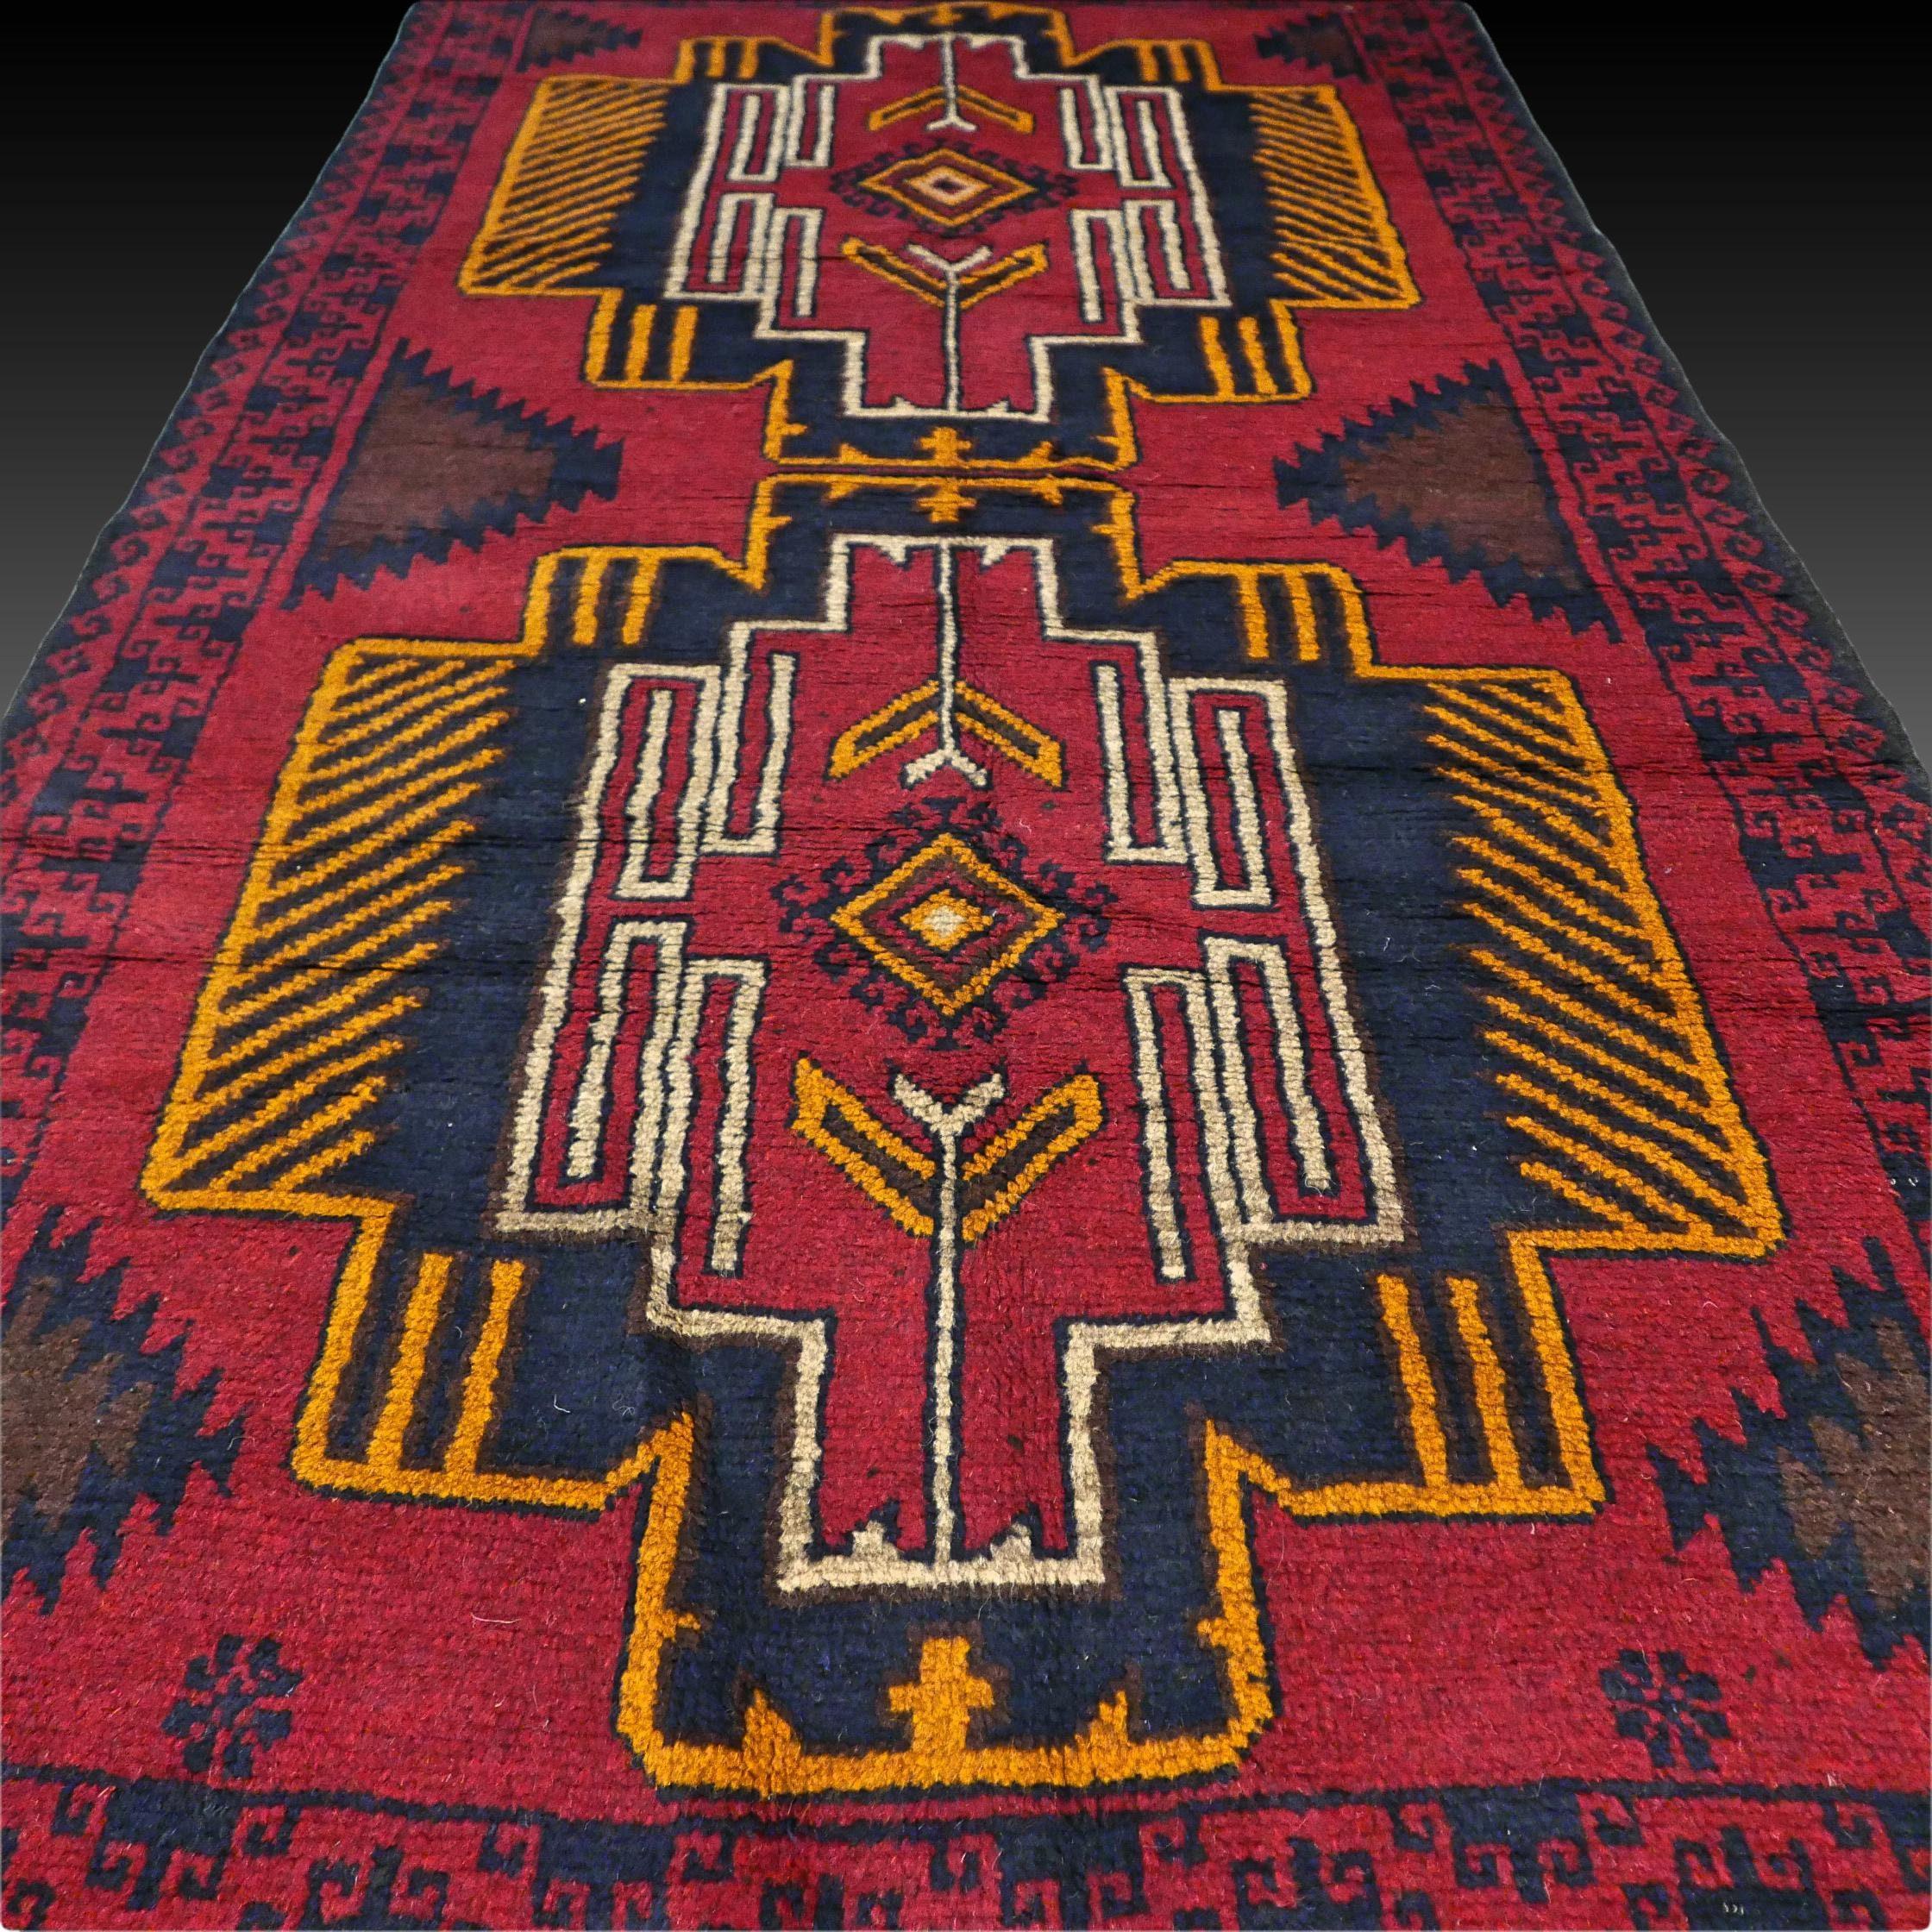 Retro Kazak Rug Tribal Nomad Rug Handmade Oushak Rug Vintage Persian Rug Oriental Boho Rug Art Deco Rug Etsy Rug Small Rug 6 2 X 3 5